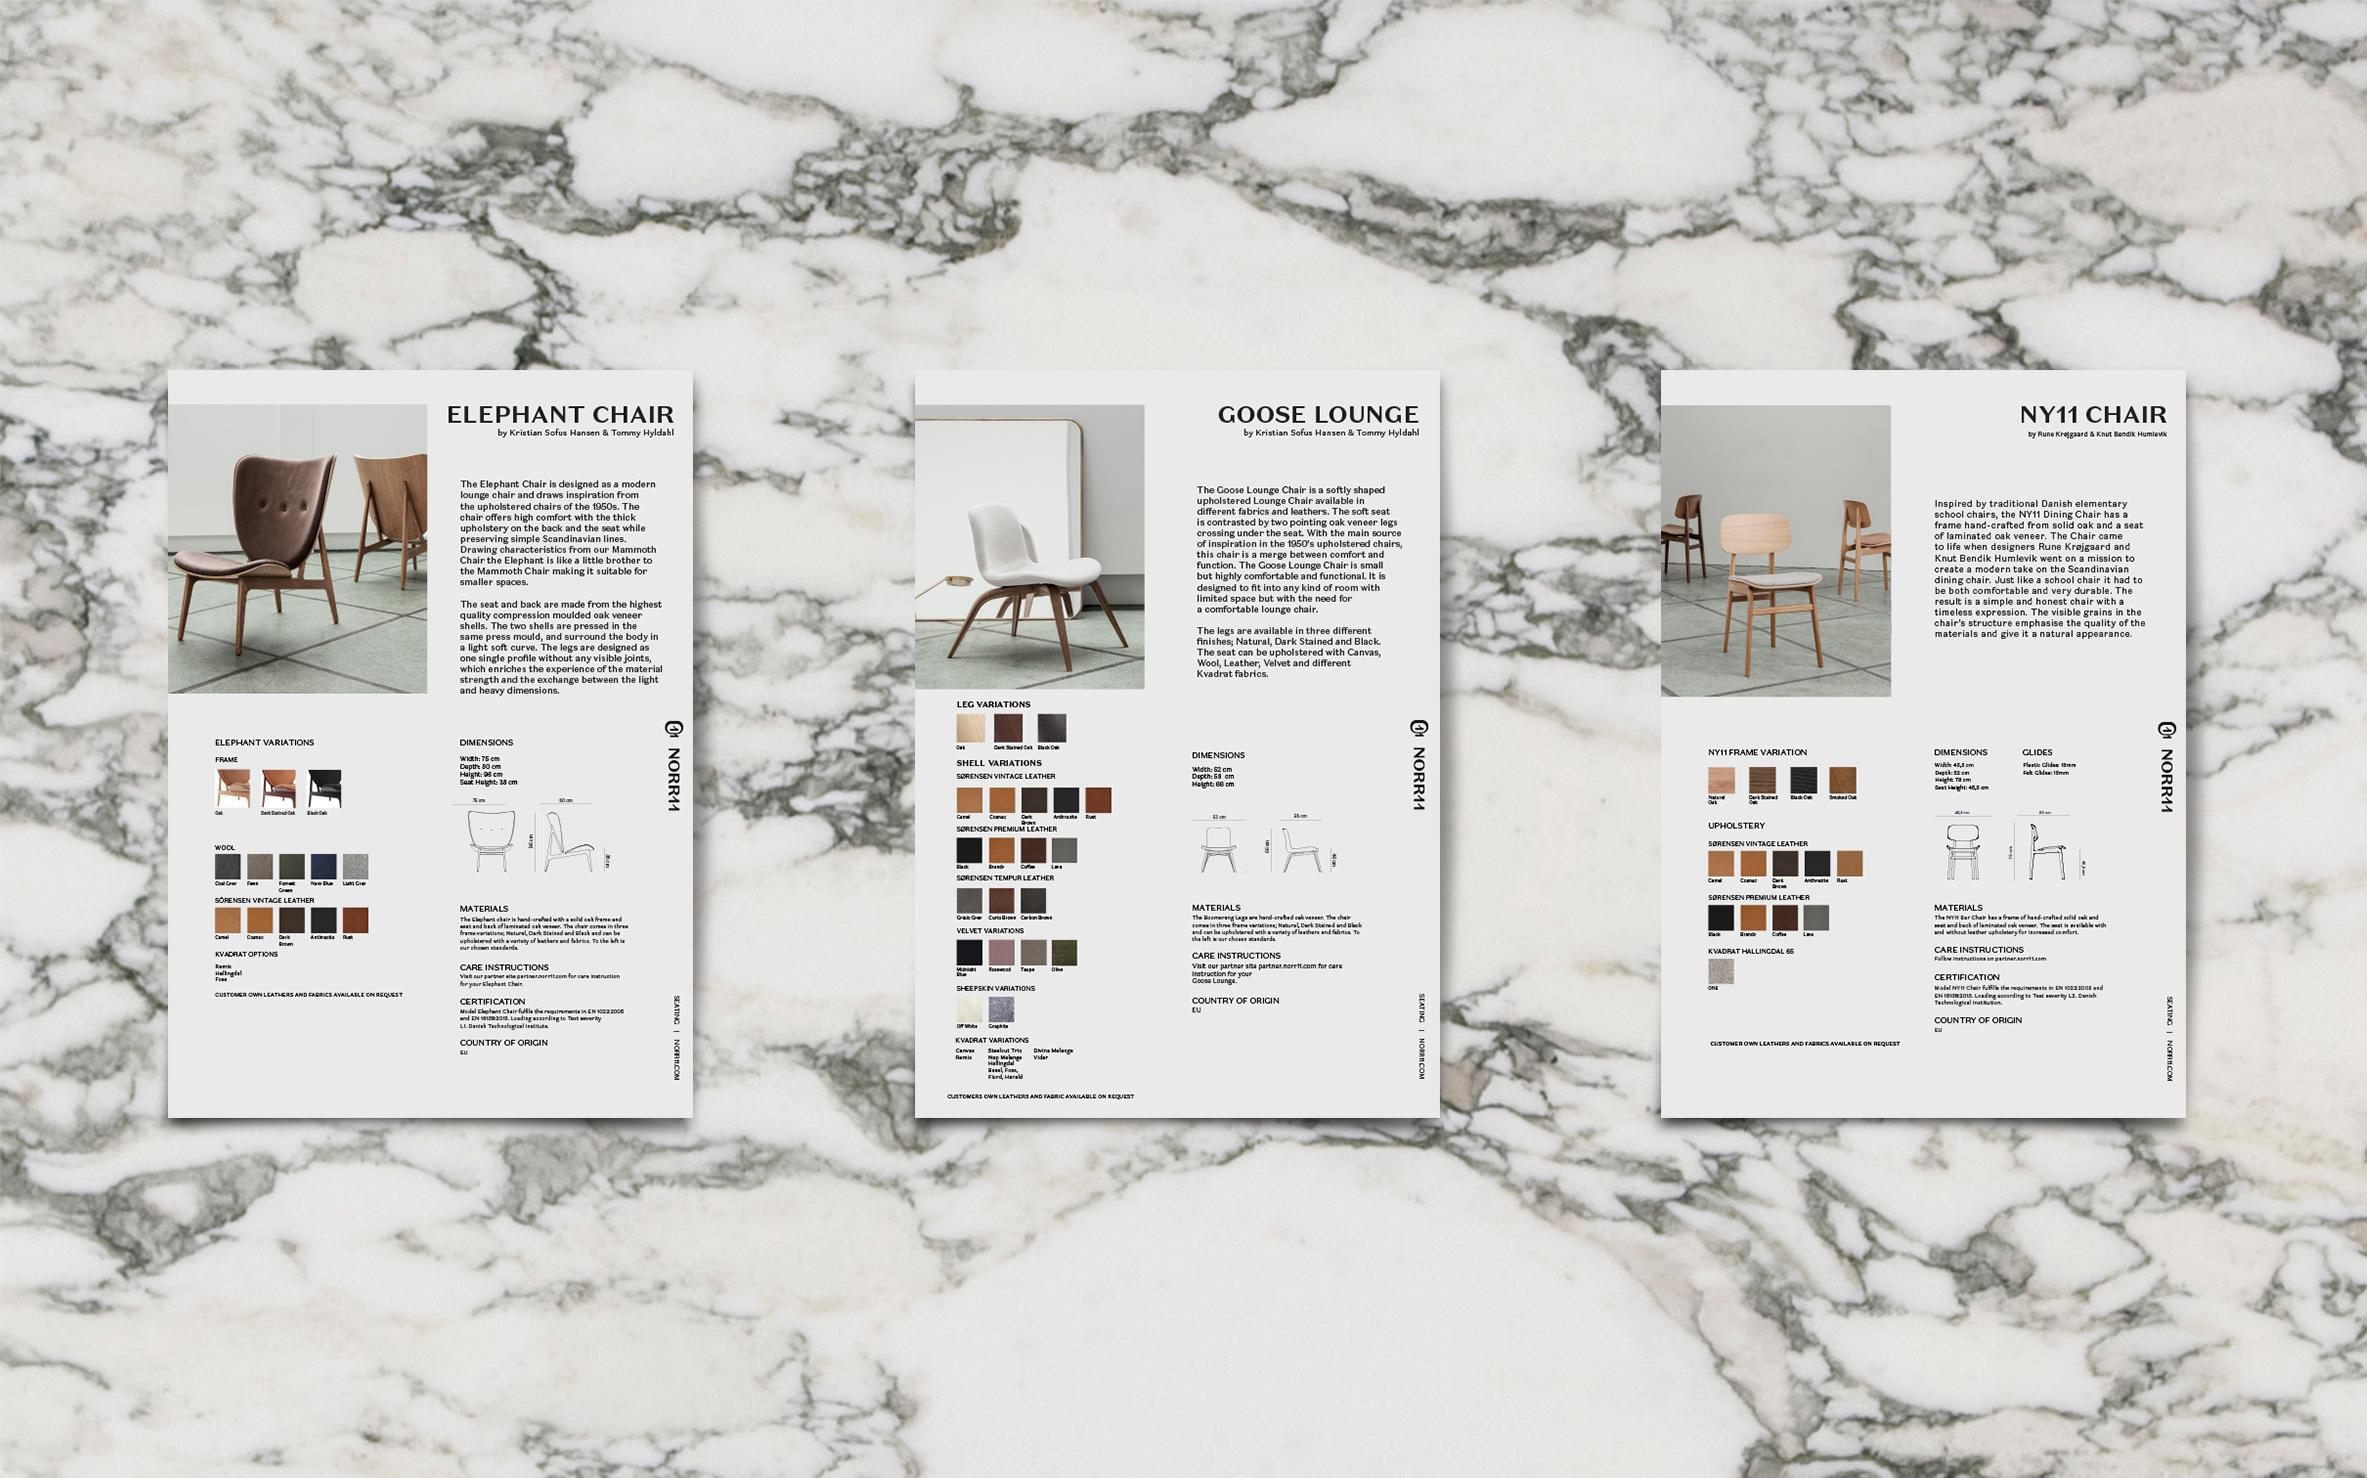 Product sheets designed in collaboration with Júlíana Sól Sigurbjörnsdóttir.